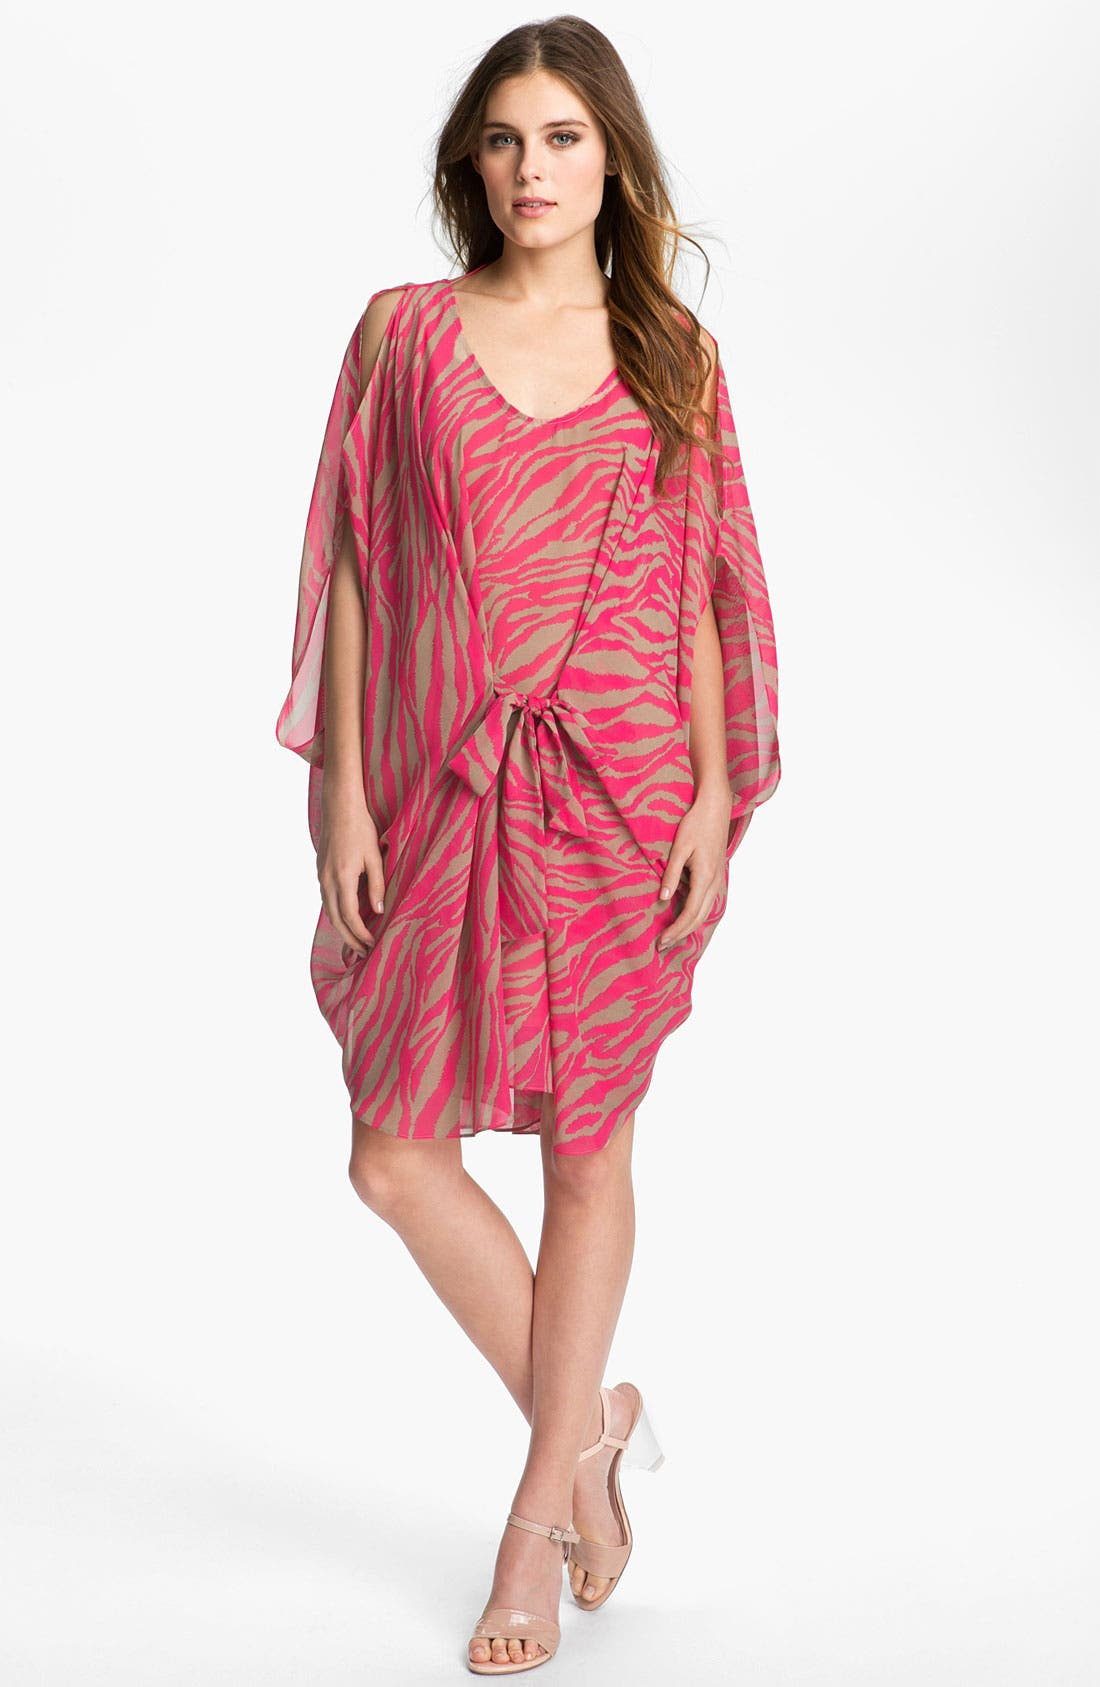 Alternate Image 1 Selected - Abi Ferrin 'Greta' Convertible Print Chiffon Dress